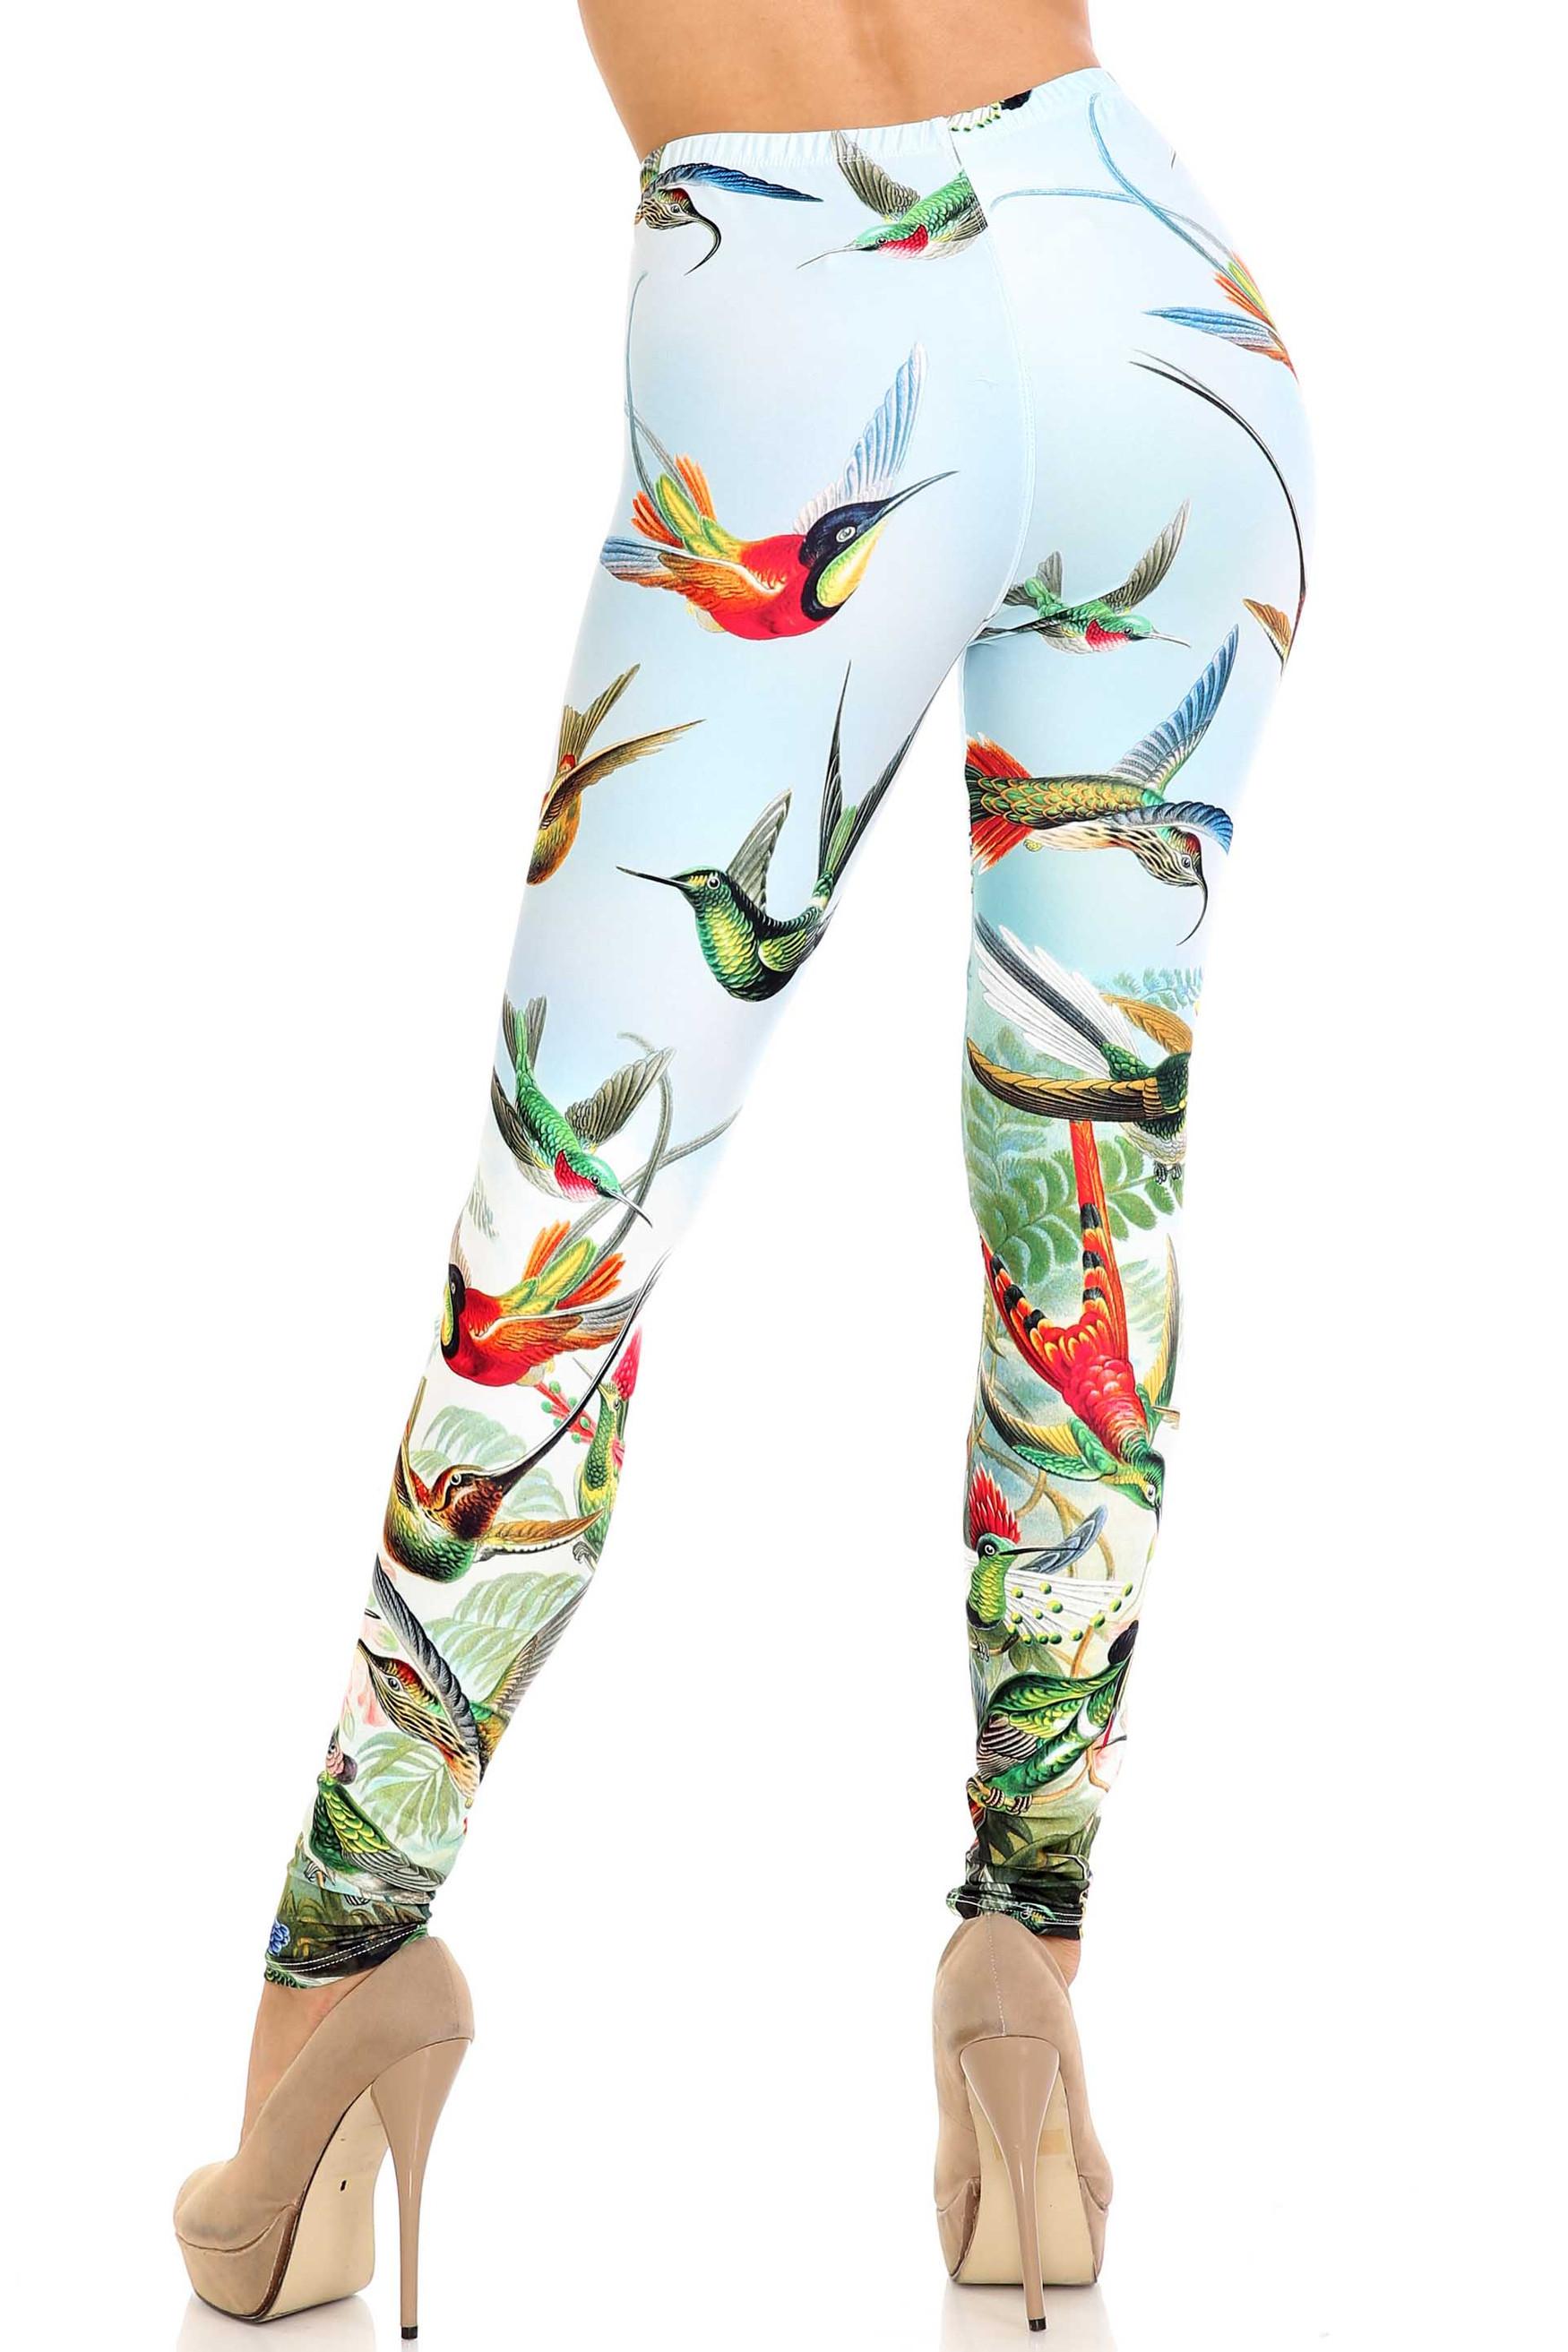 Creamy Soft Happy Hummingbirds Leggings - USA Fashion™